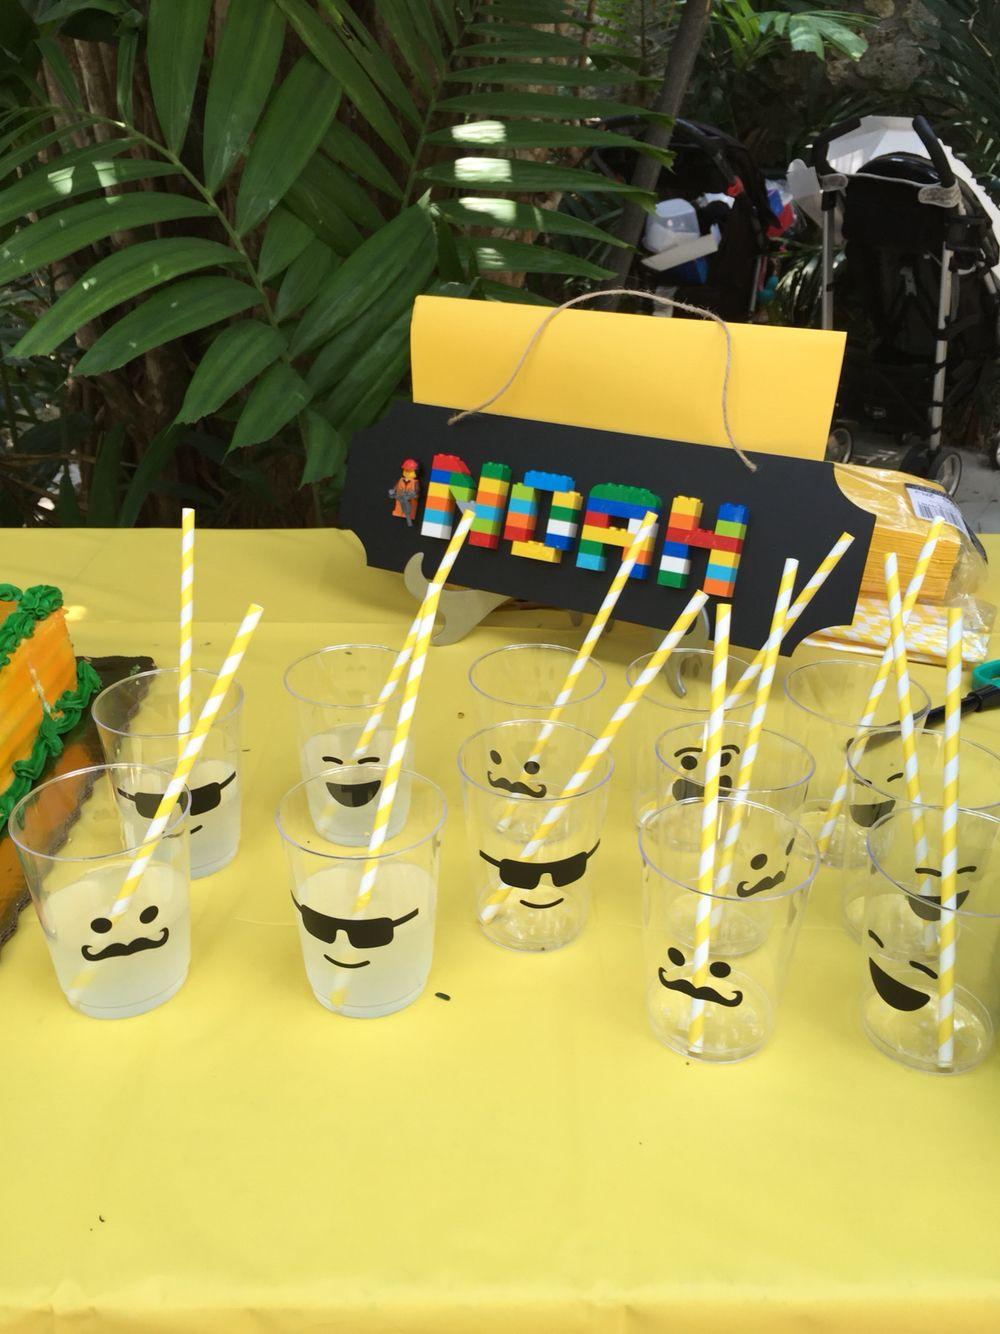 Lego face cups